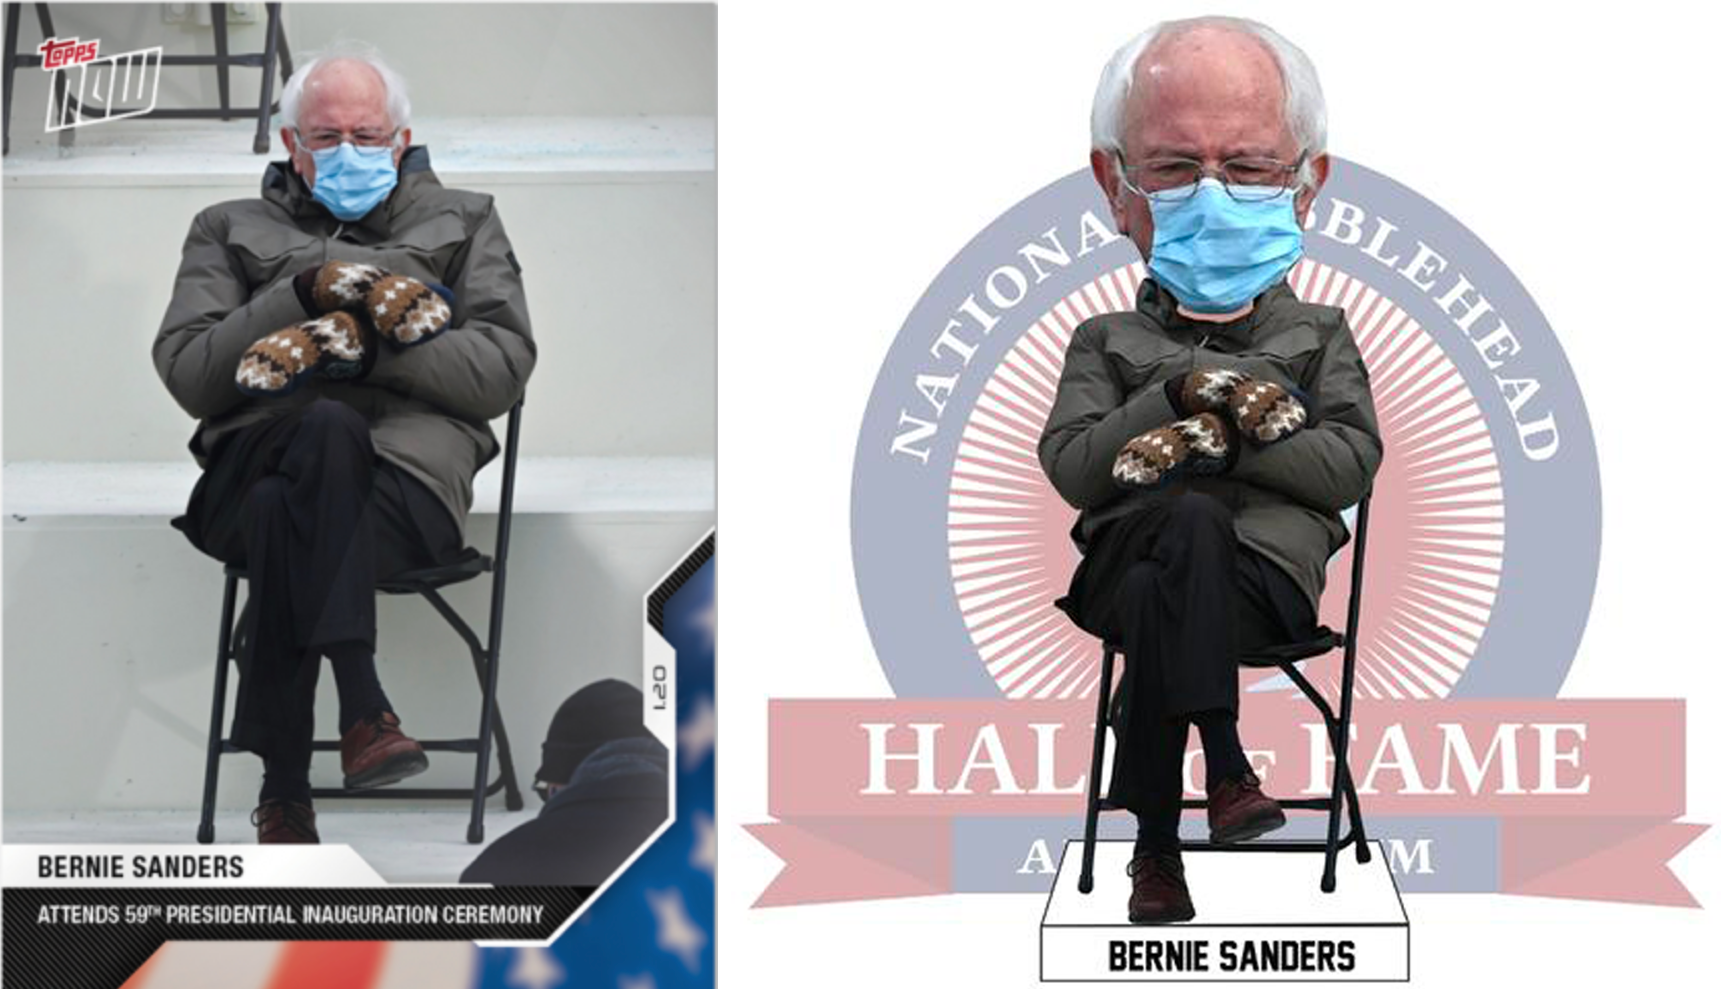 Inauguration 2021 Topps Makes A Bernie Sanders Baseball Card